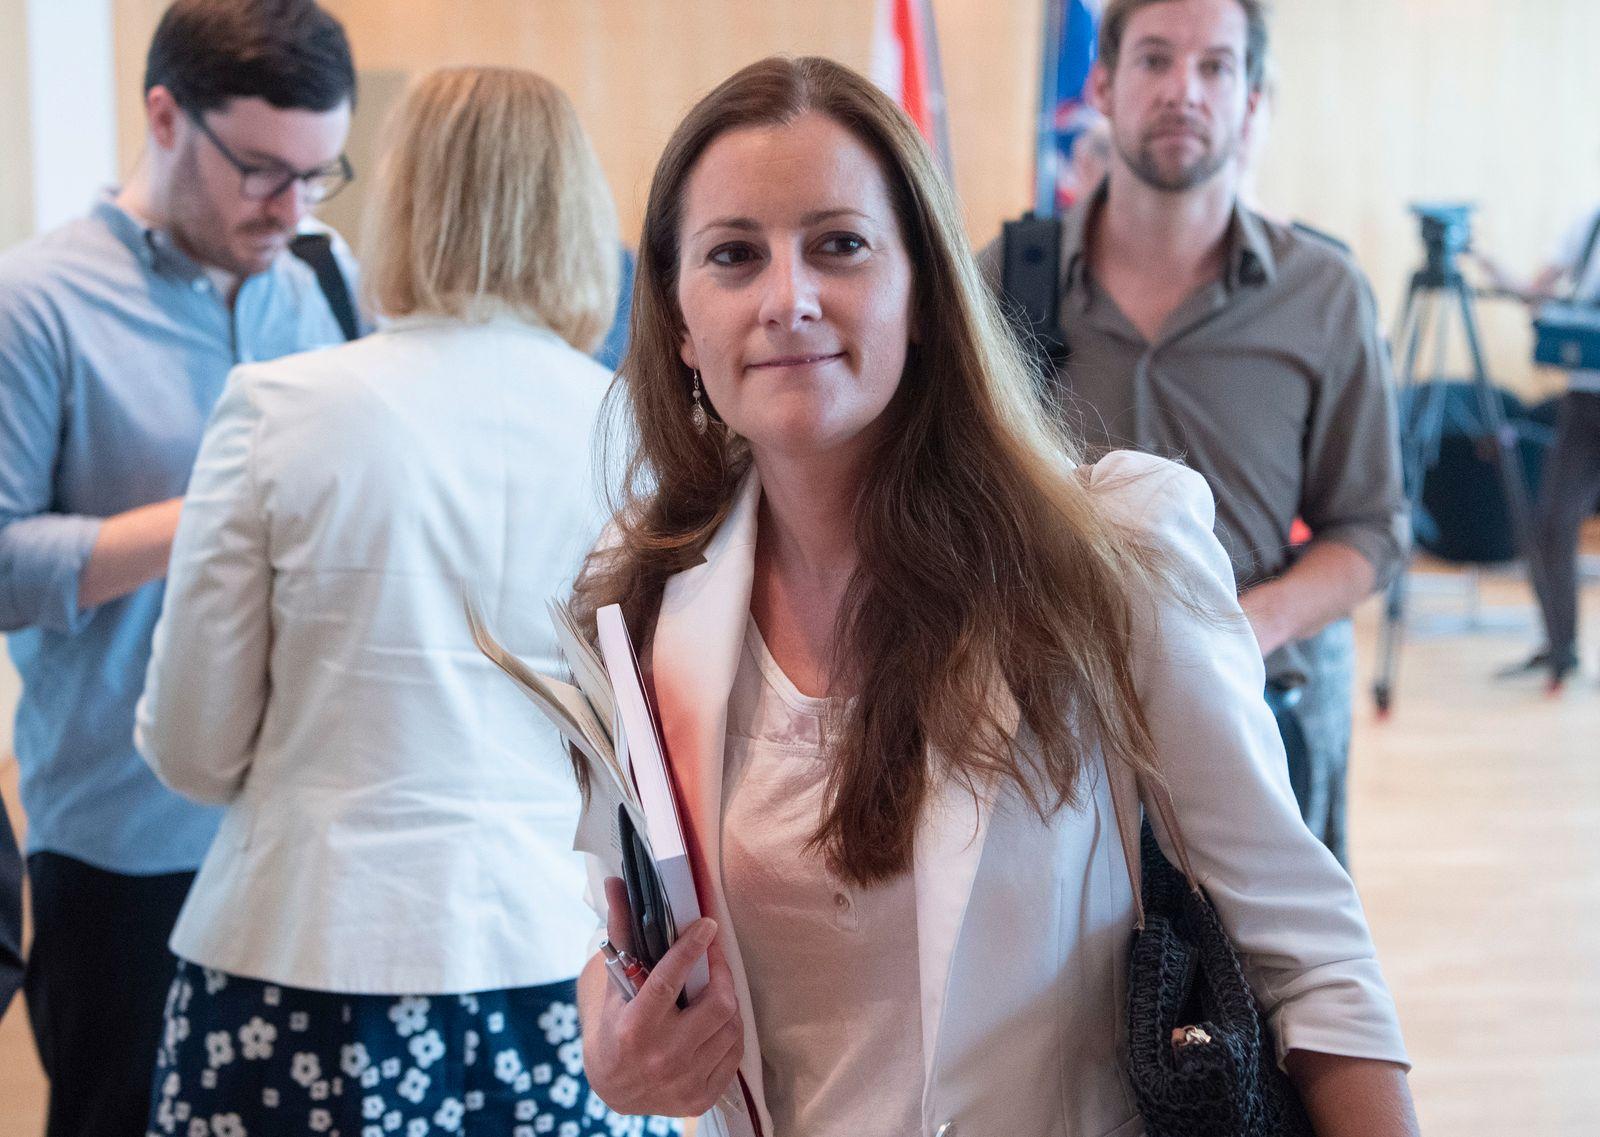 Sondersitzung Innenausschuss zu Mordfall Lübcke in Hessen